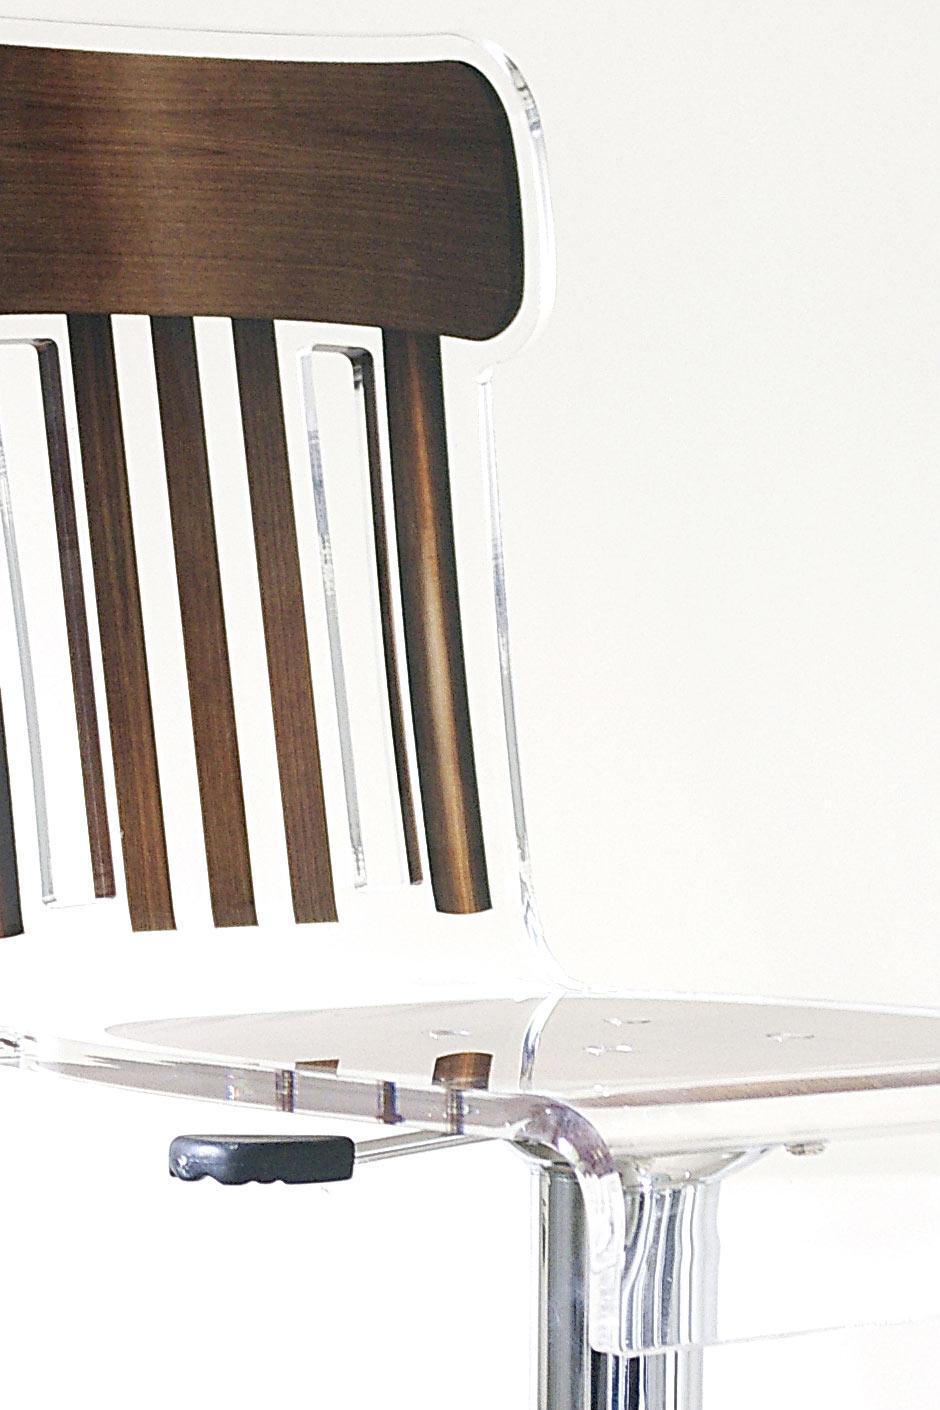 chaises plexiglas latest chaise plexi ikea ikea chaise cuisine ikea chaise de cuisine latest. Black Bedroom Furniture Sets. Home Design Ideas